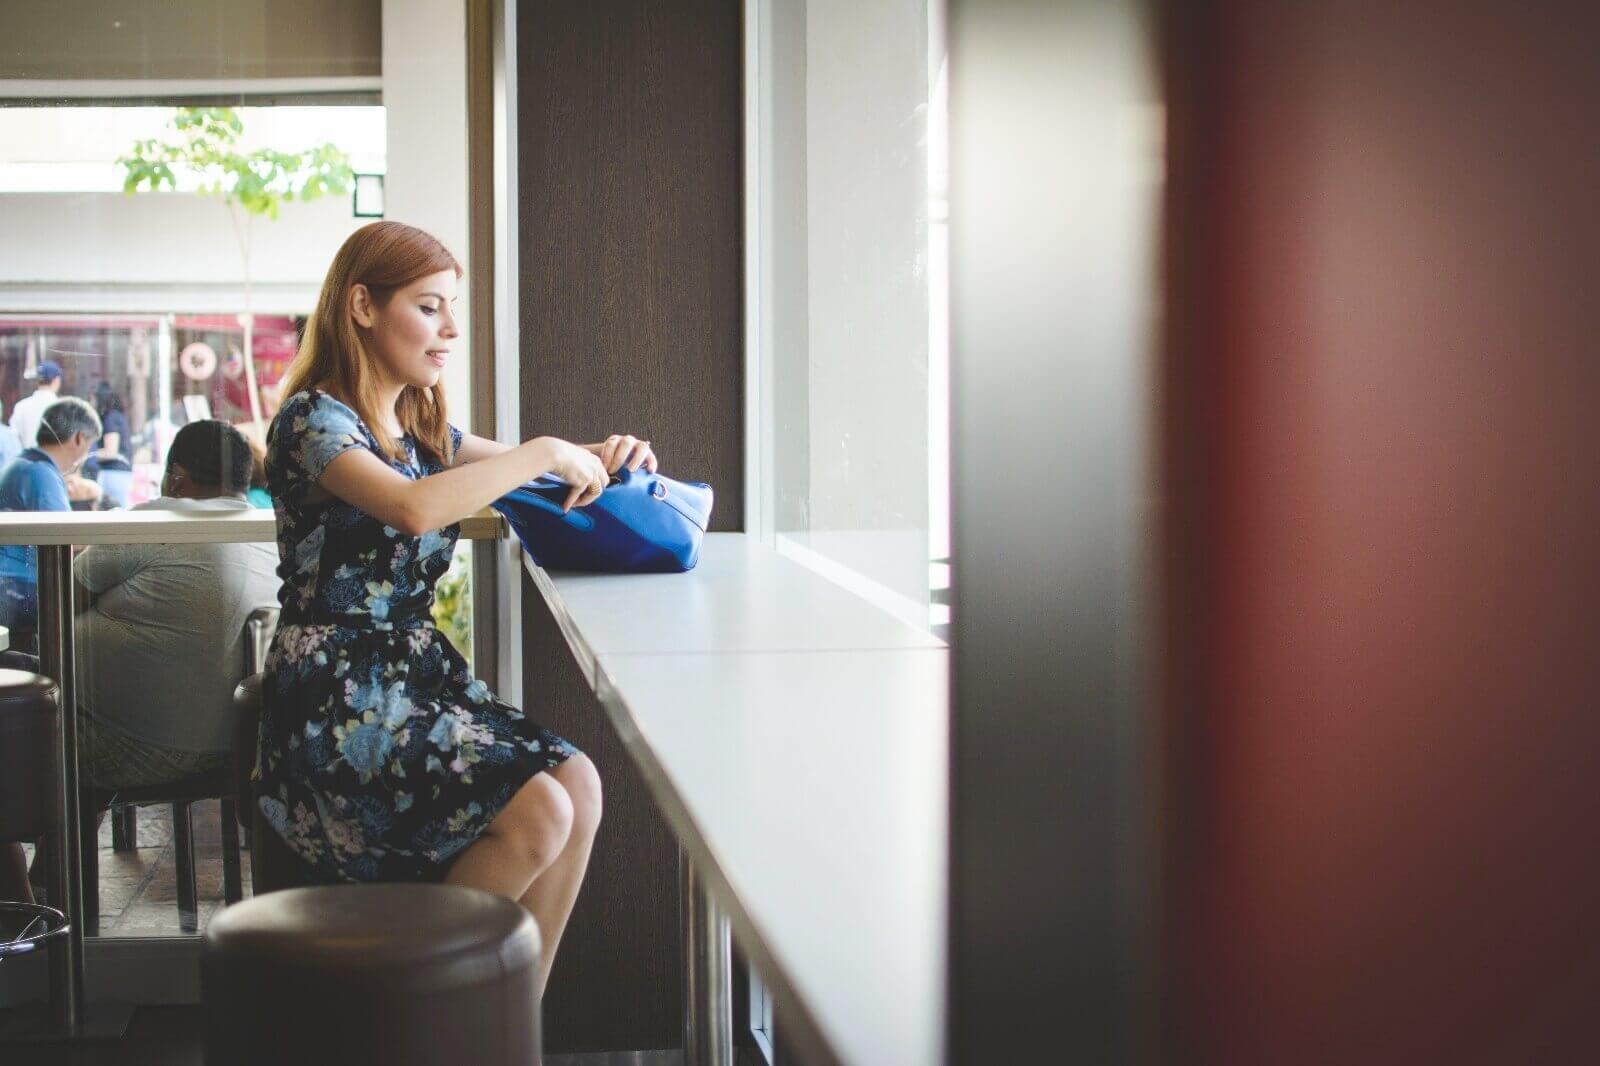 gamiss-black-strappy-sandals-blue-floral-dress-rosegal-cobalt-blue-tote-bag-deborah-ferrero-style-by-deb08